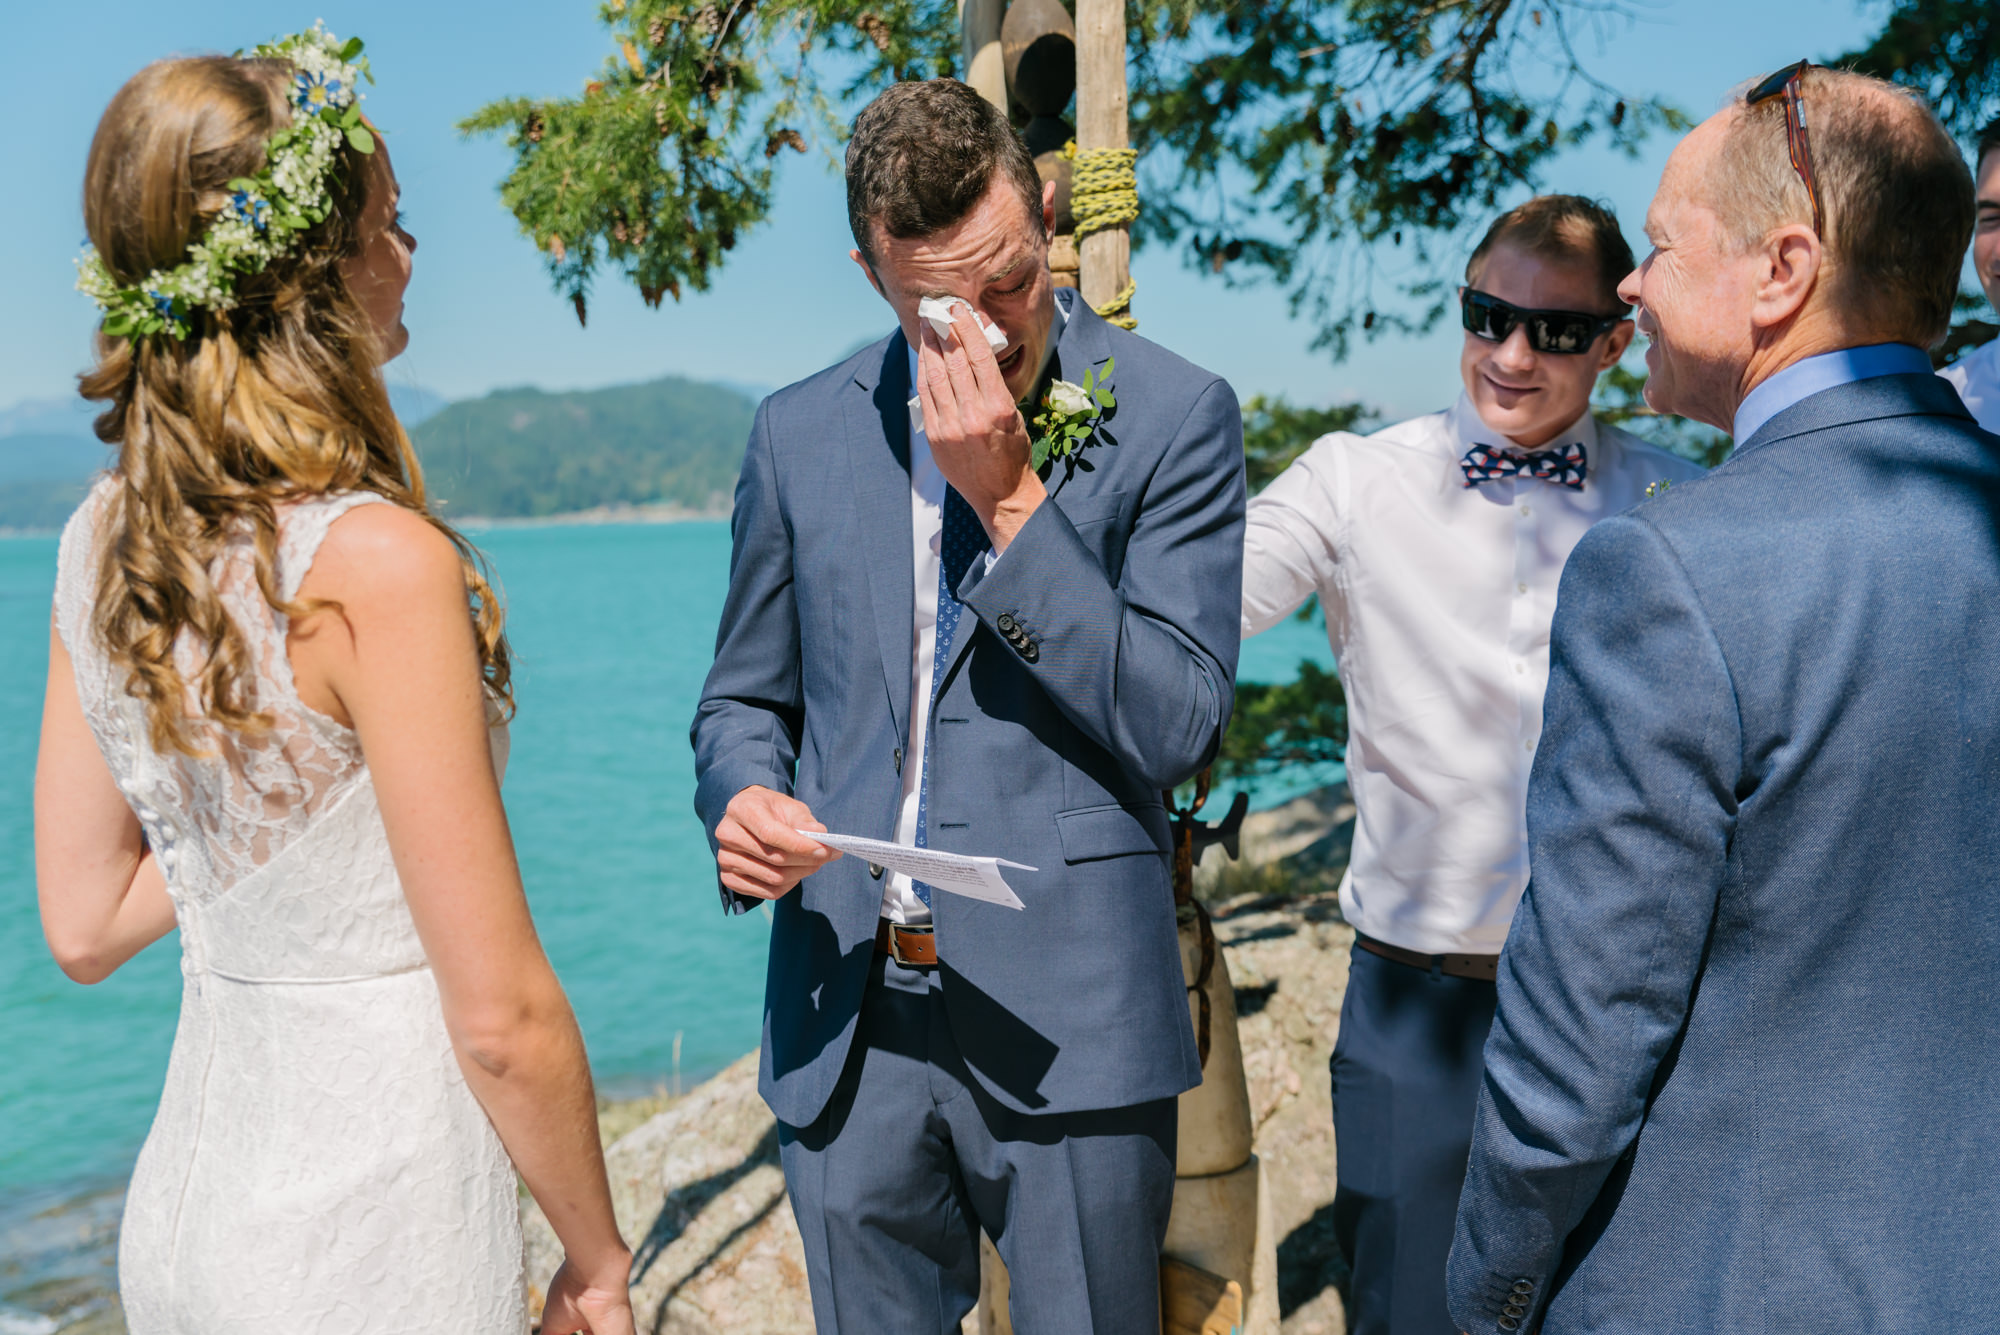 bowen_island_wedding_photographer_vancouver142352_12_ally&james.jpg